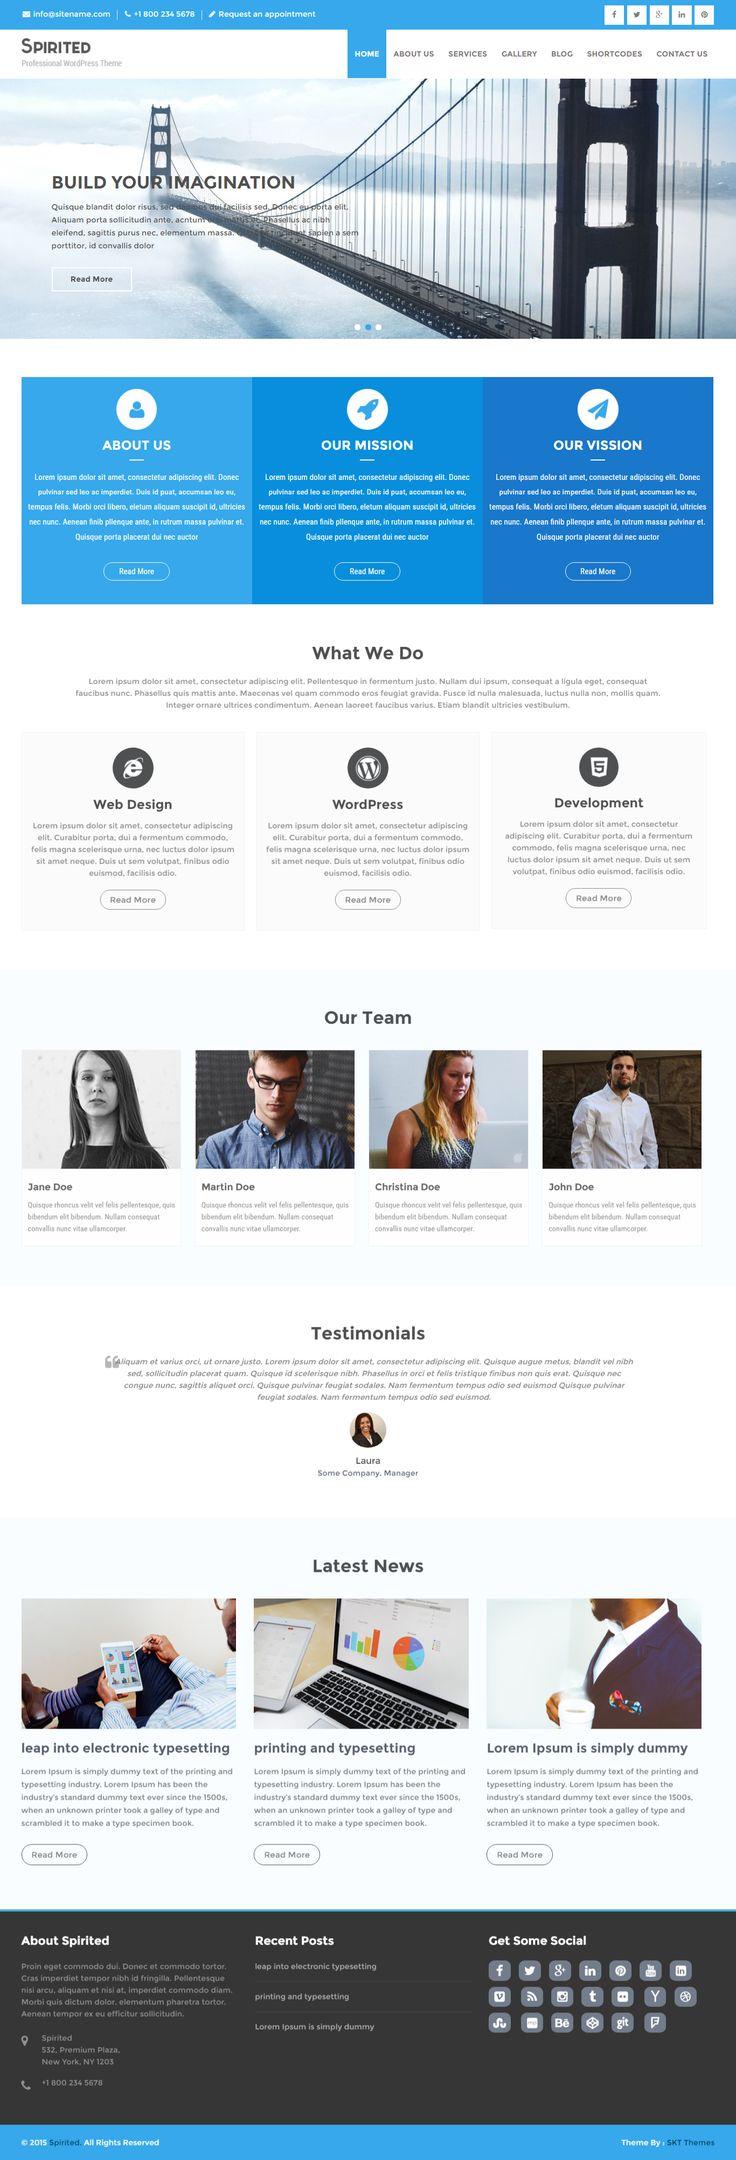 Free Landing Page WordPress Theme for Landing Page Sites